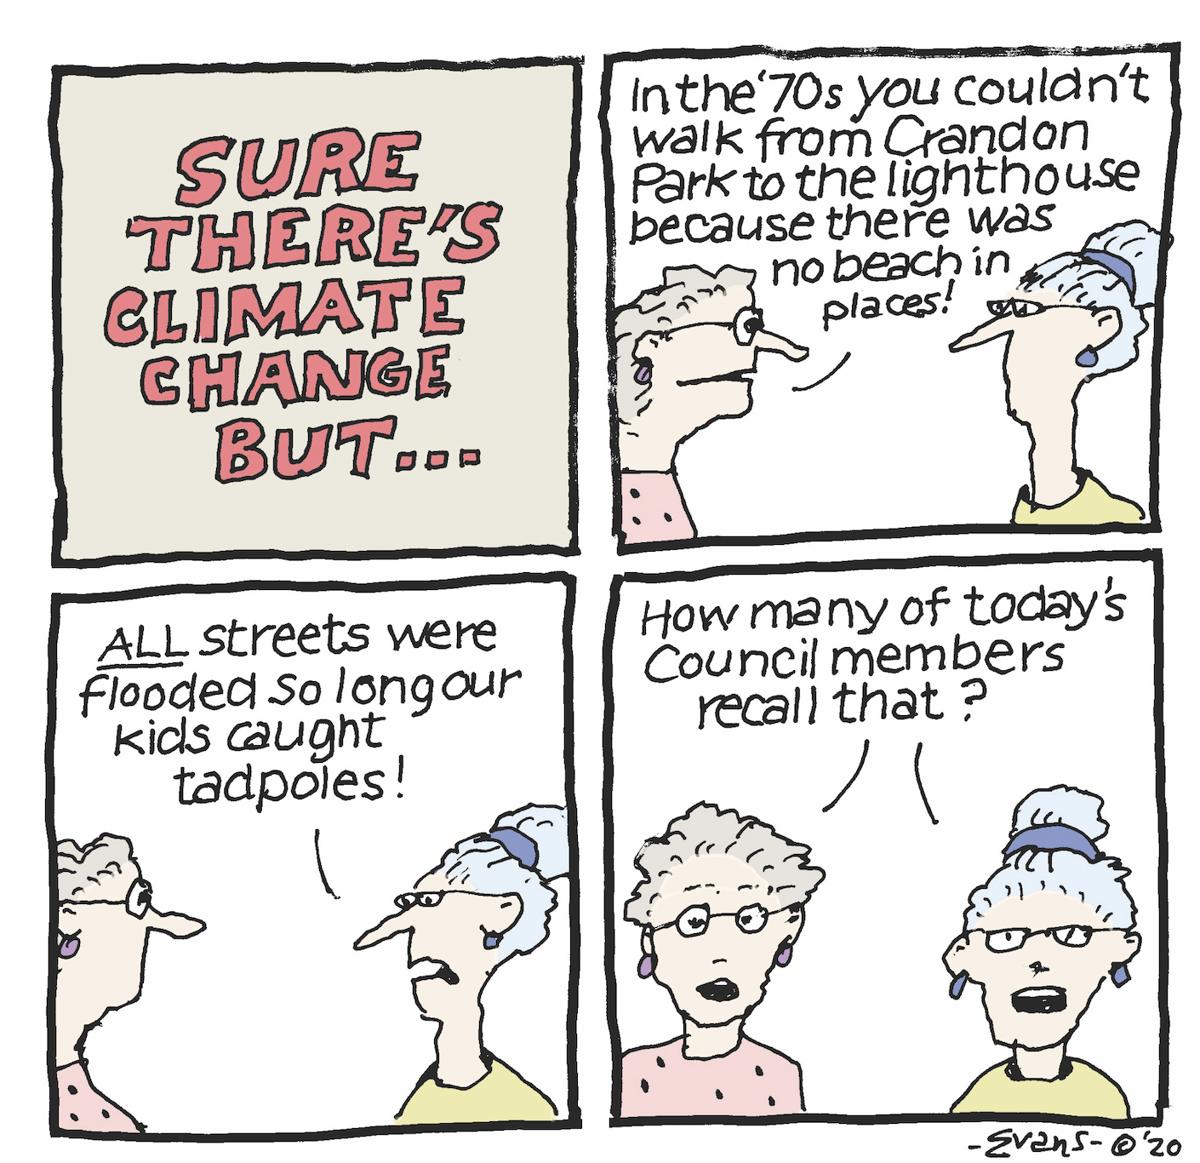 Cartoonist provides some KB cartoon perspective